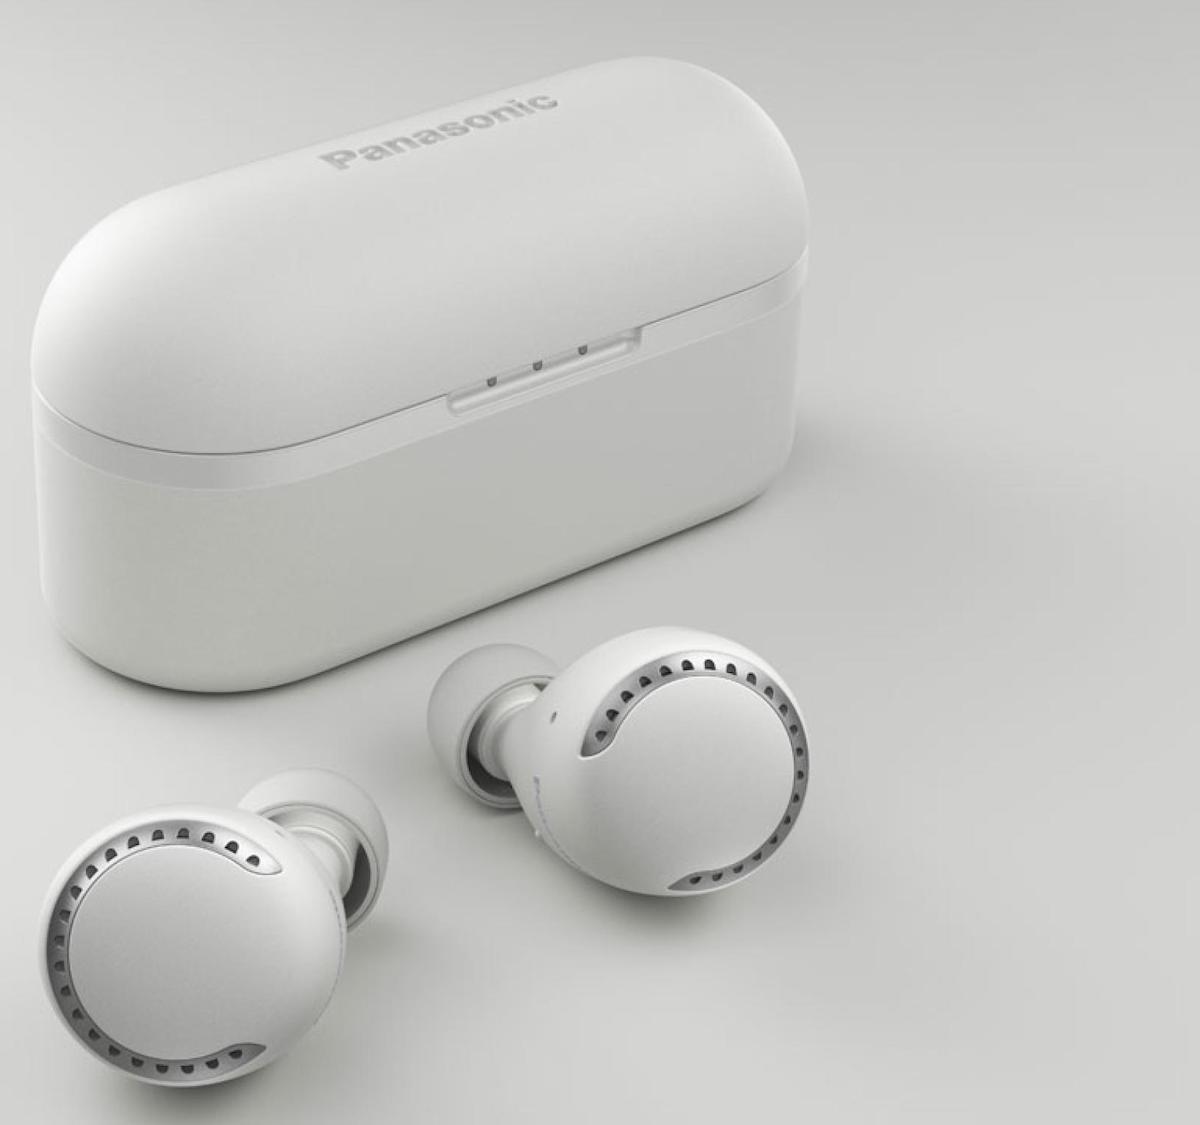 Panasonic RZ-S500W Wireless Bluetooth Earphones offer dual hybrid noise cancelling